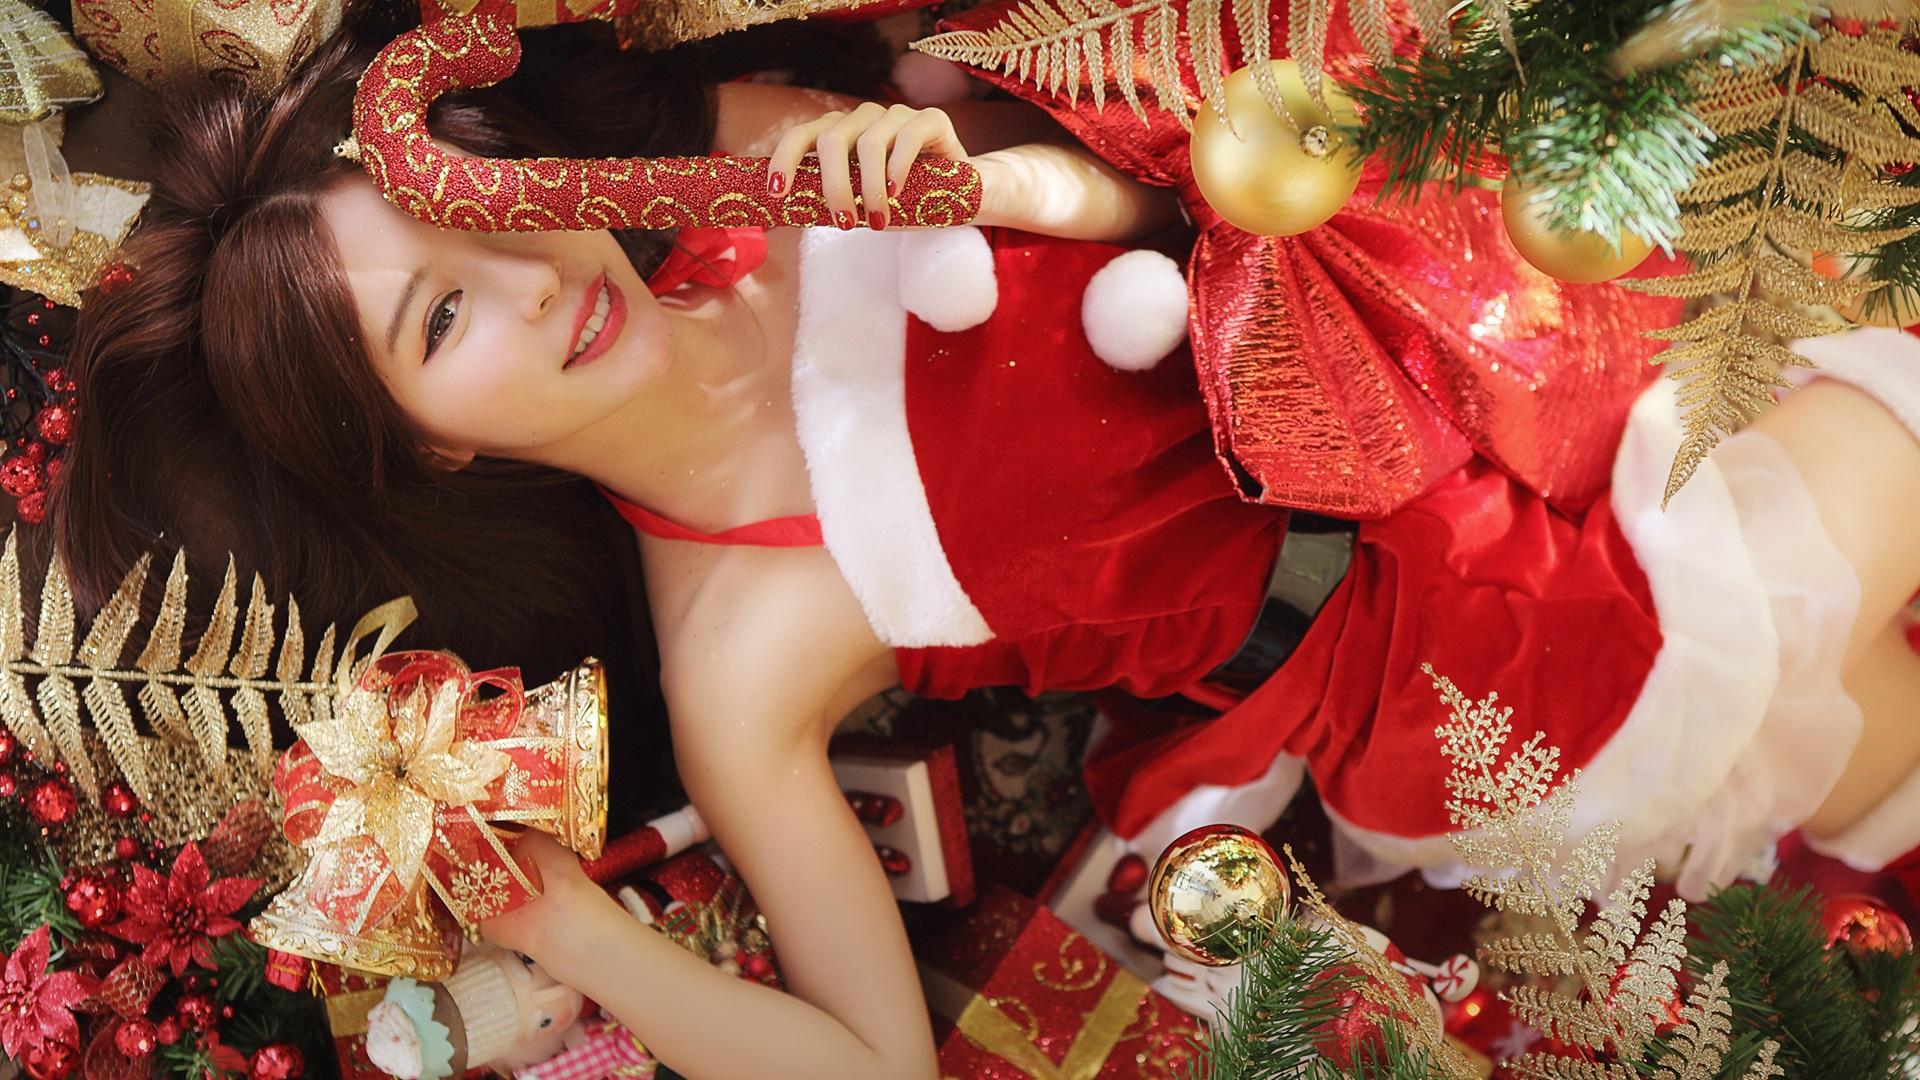 Christmas dress for girl - Christmas Dress For Girl 3